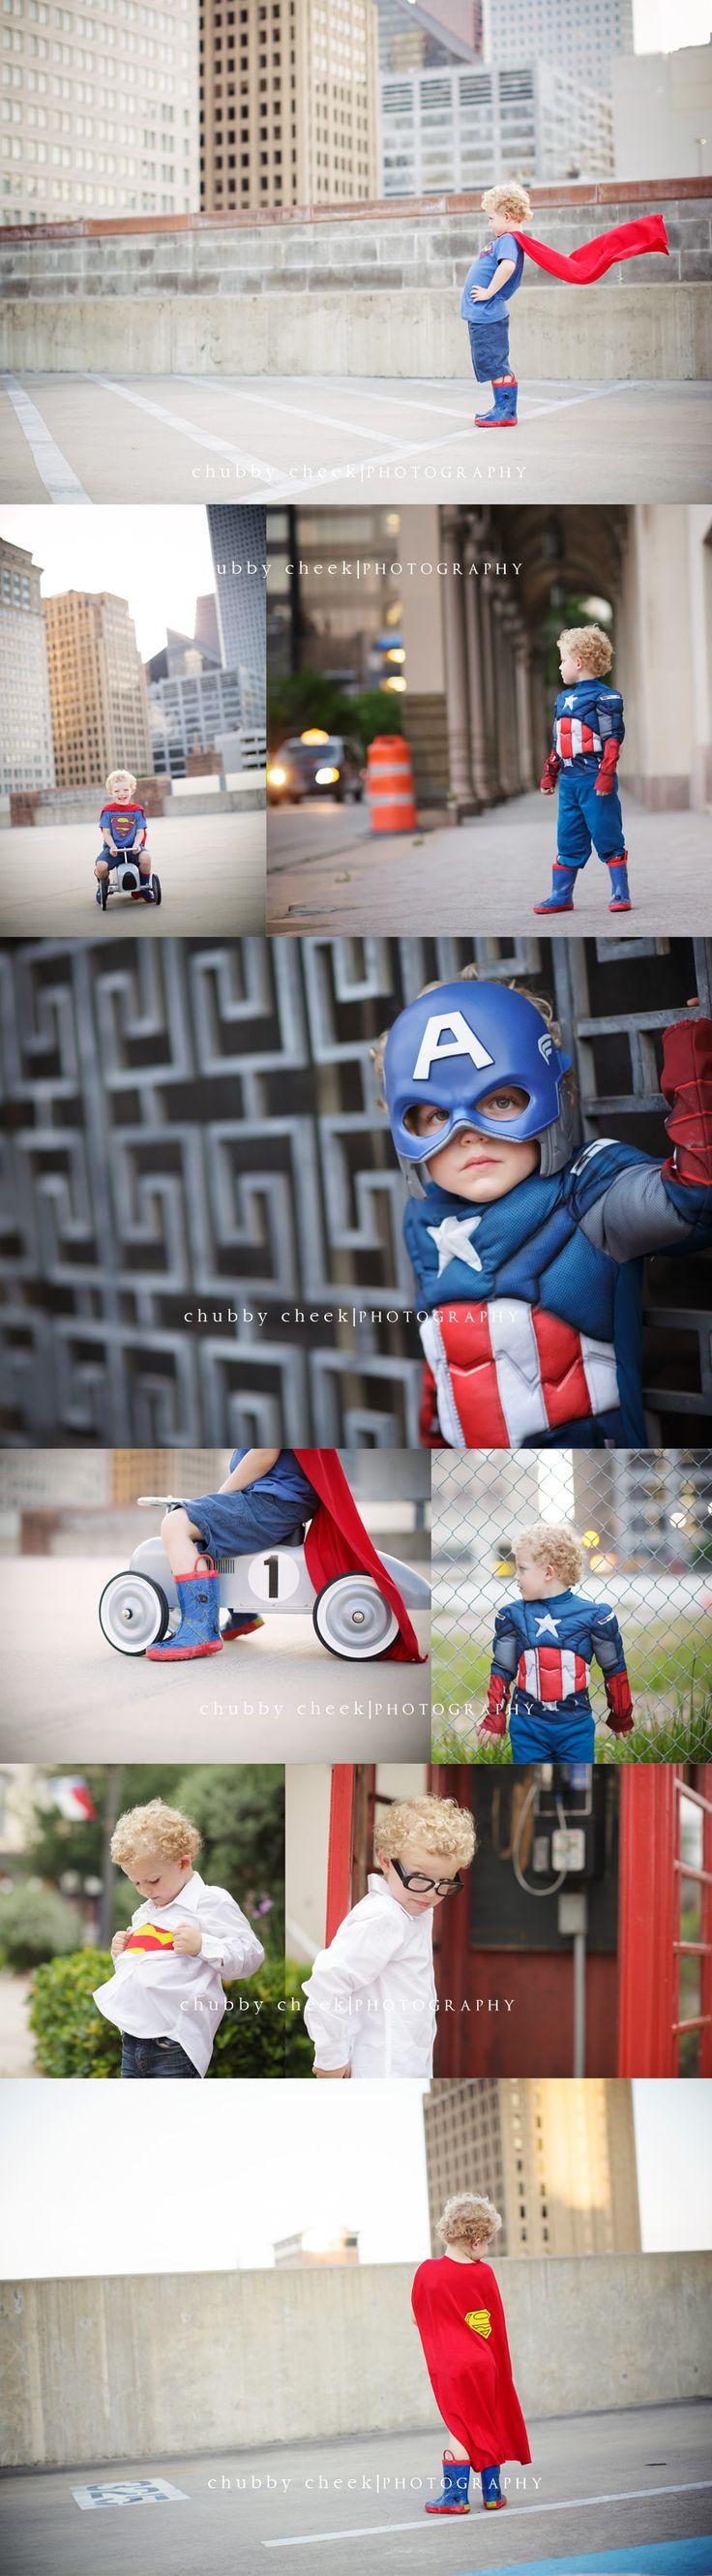 superman saves houston texas… sugarland tx child photographer | Chubby Cheek Photography Houston, TX Natural Light Photographer